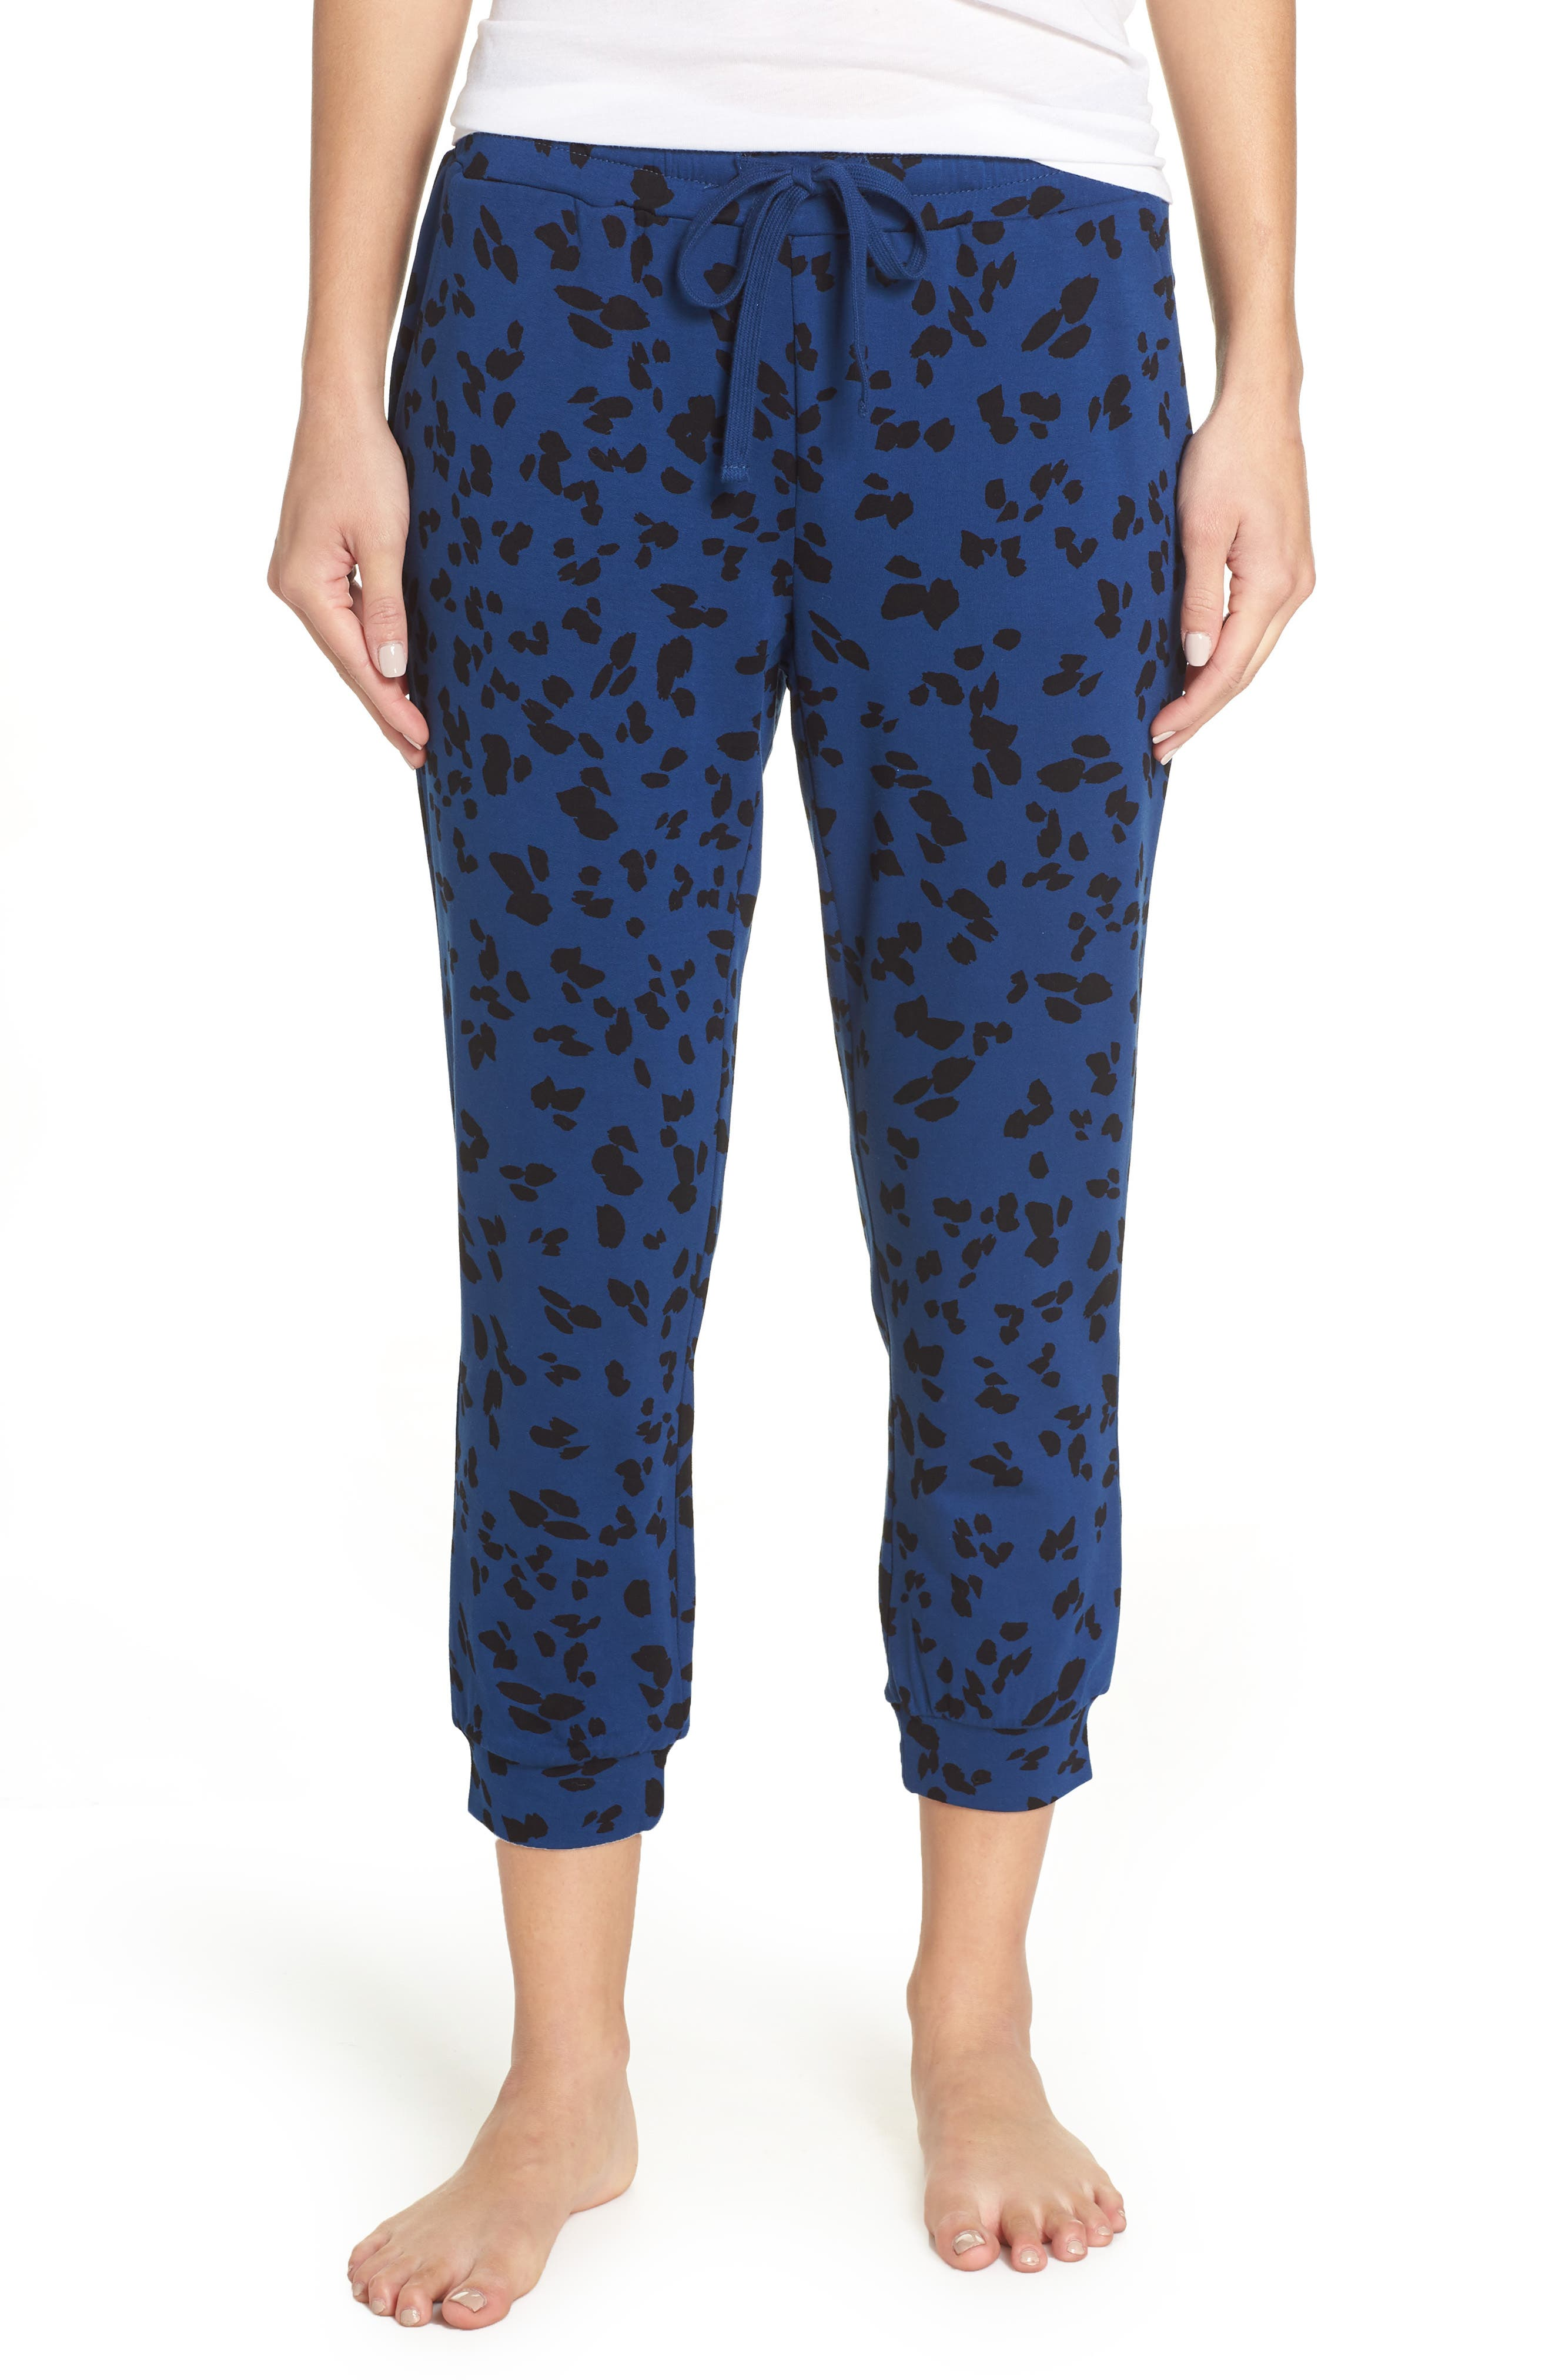 Totally Trending Leopard Print Jogger Pants,                             Main thumbnail 1, color,                             MARINE